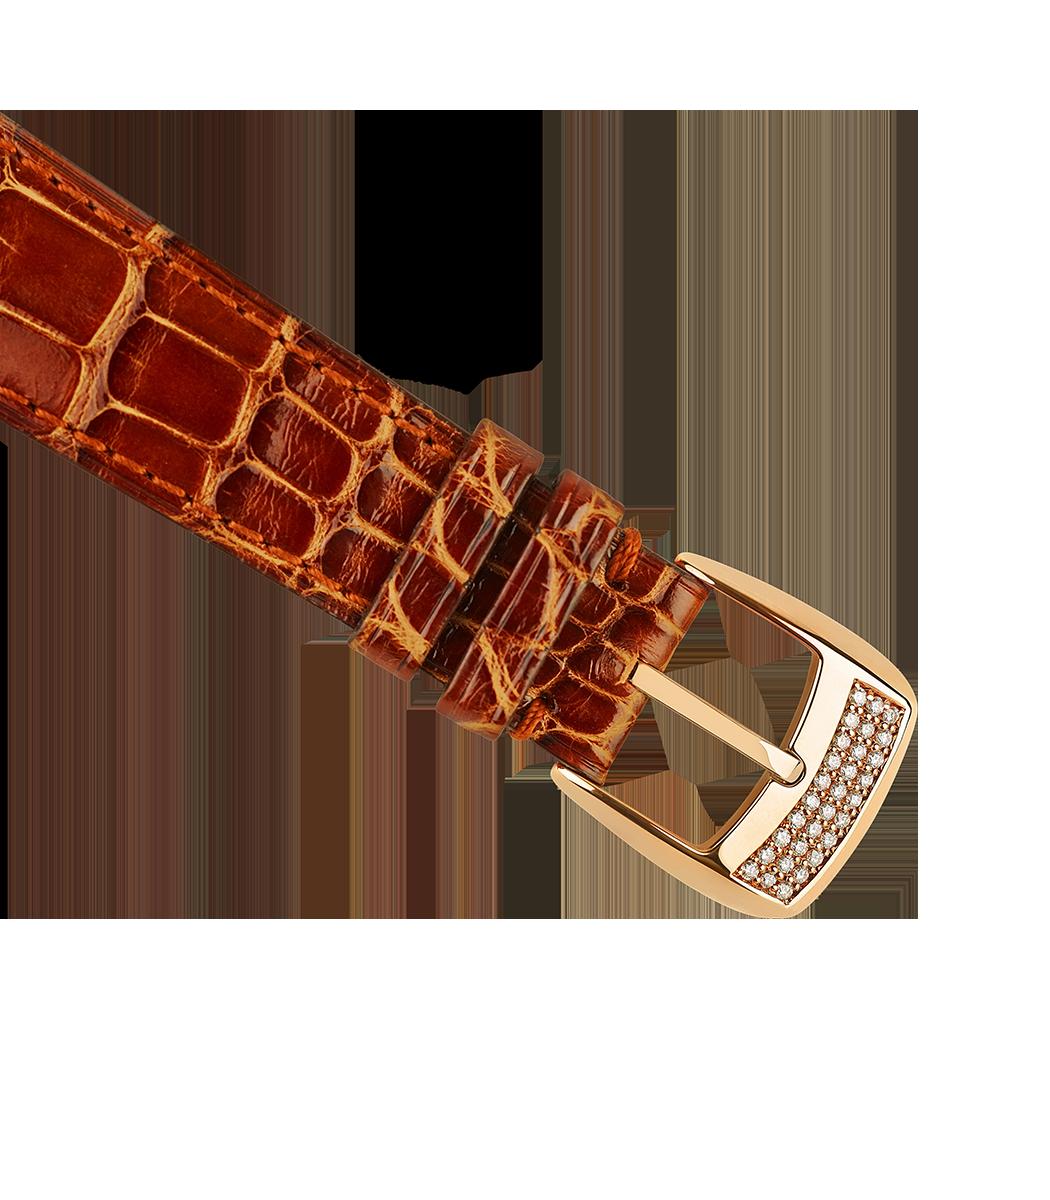 Regent 1609 AD 4047 limited edition diamond watch brown alligator strap